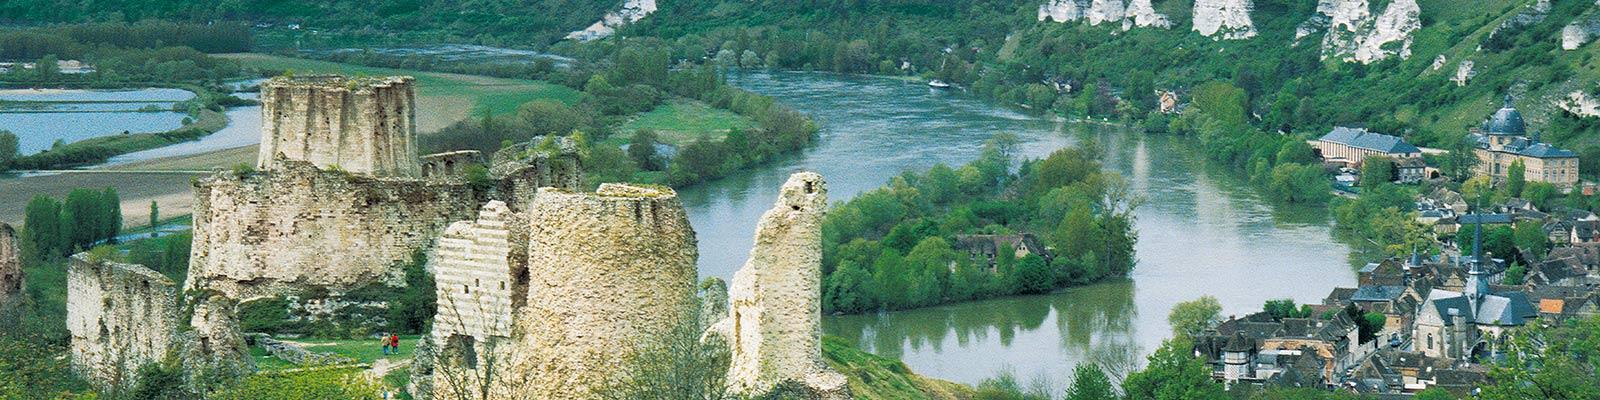 Seine River Cruises Europe Viking River Cruises